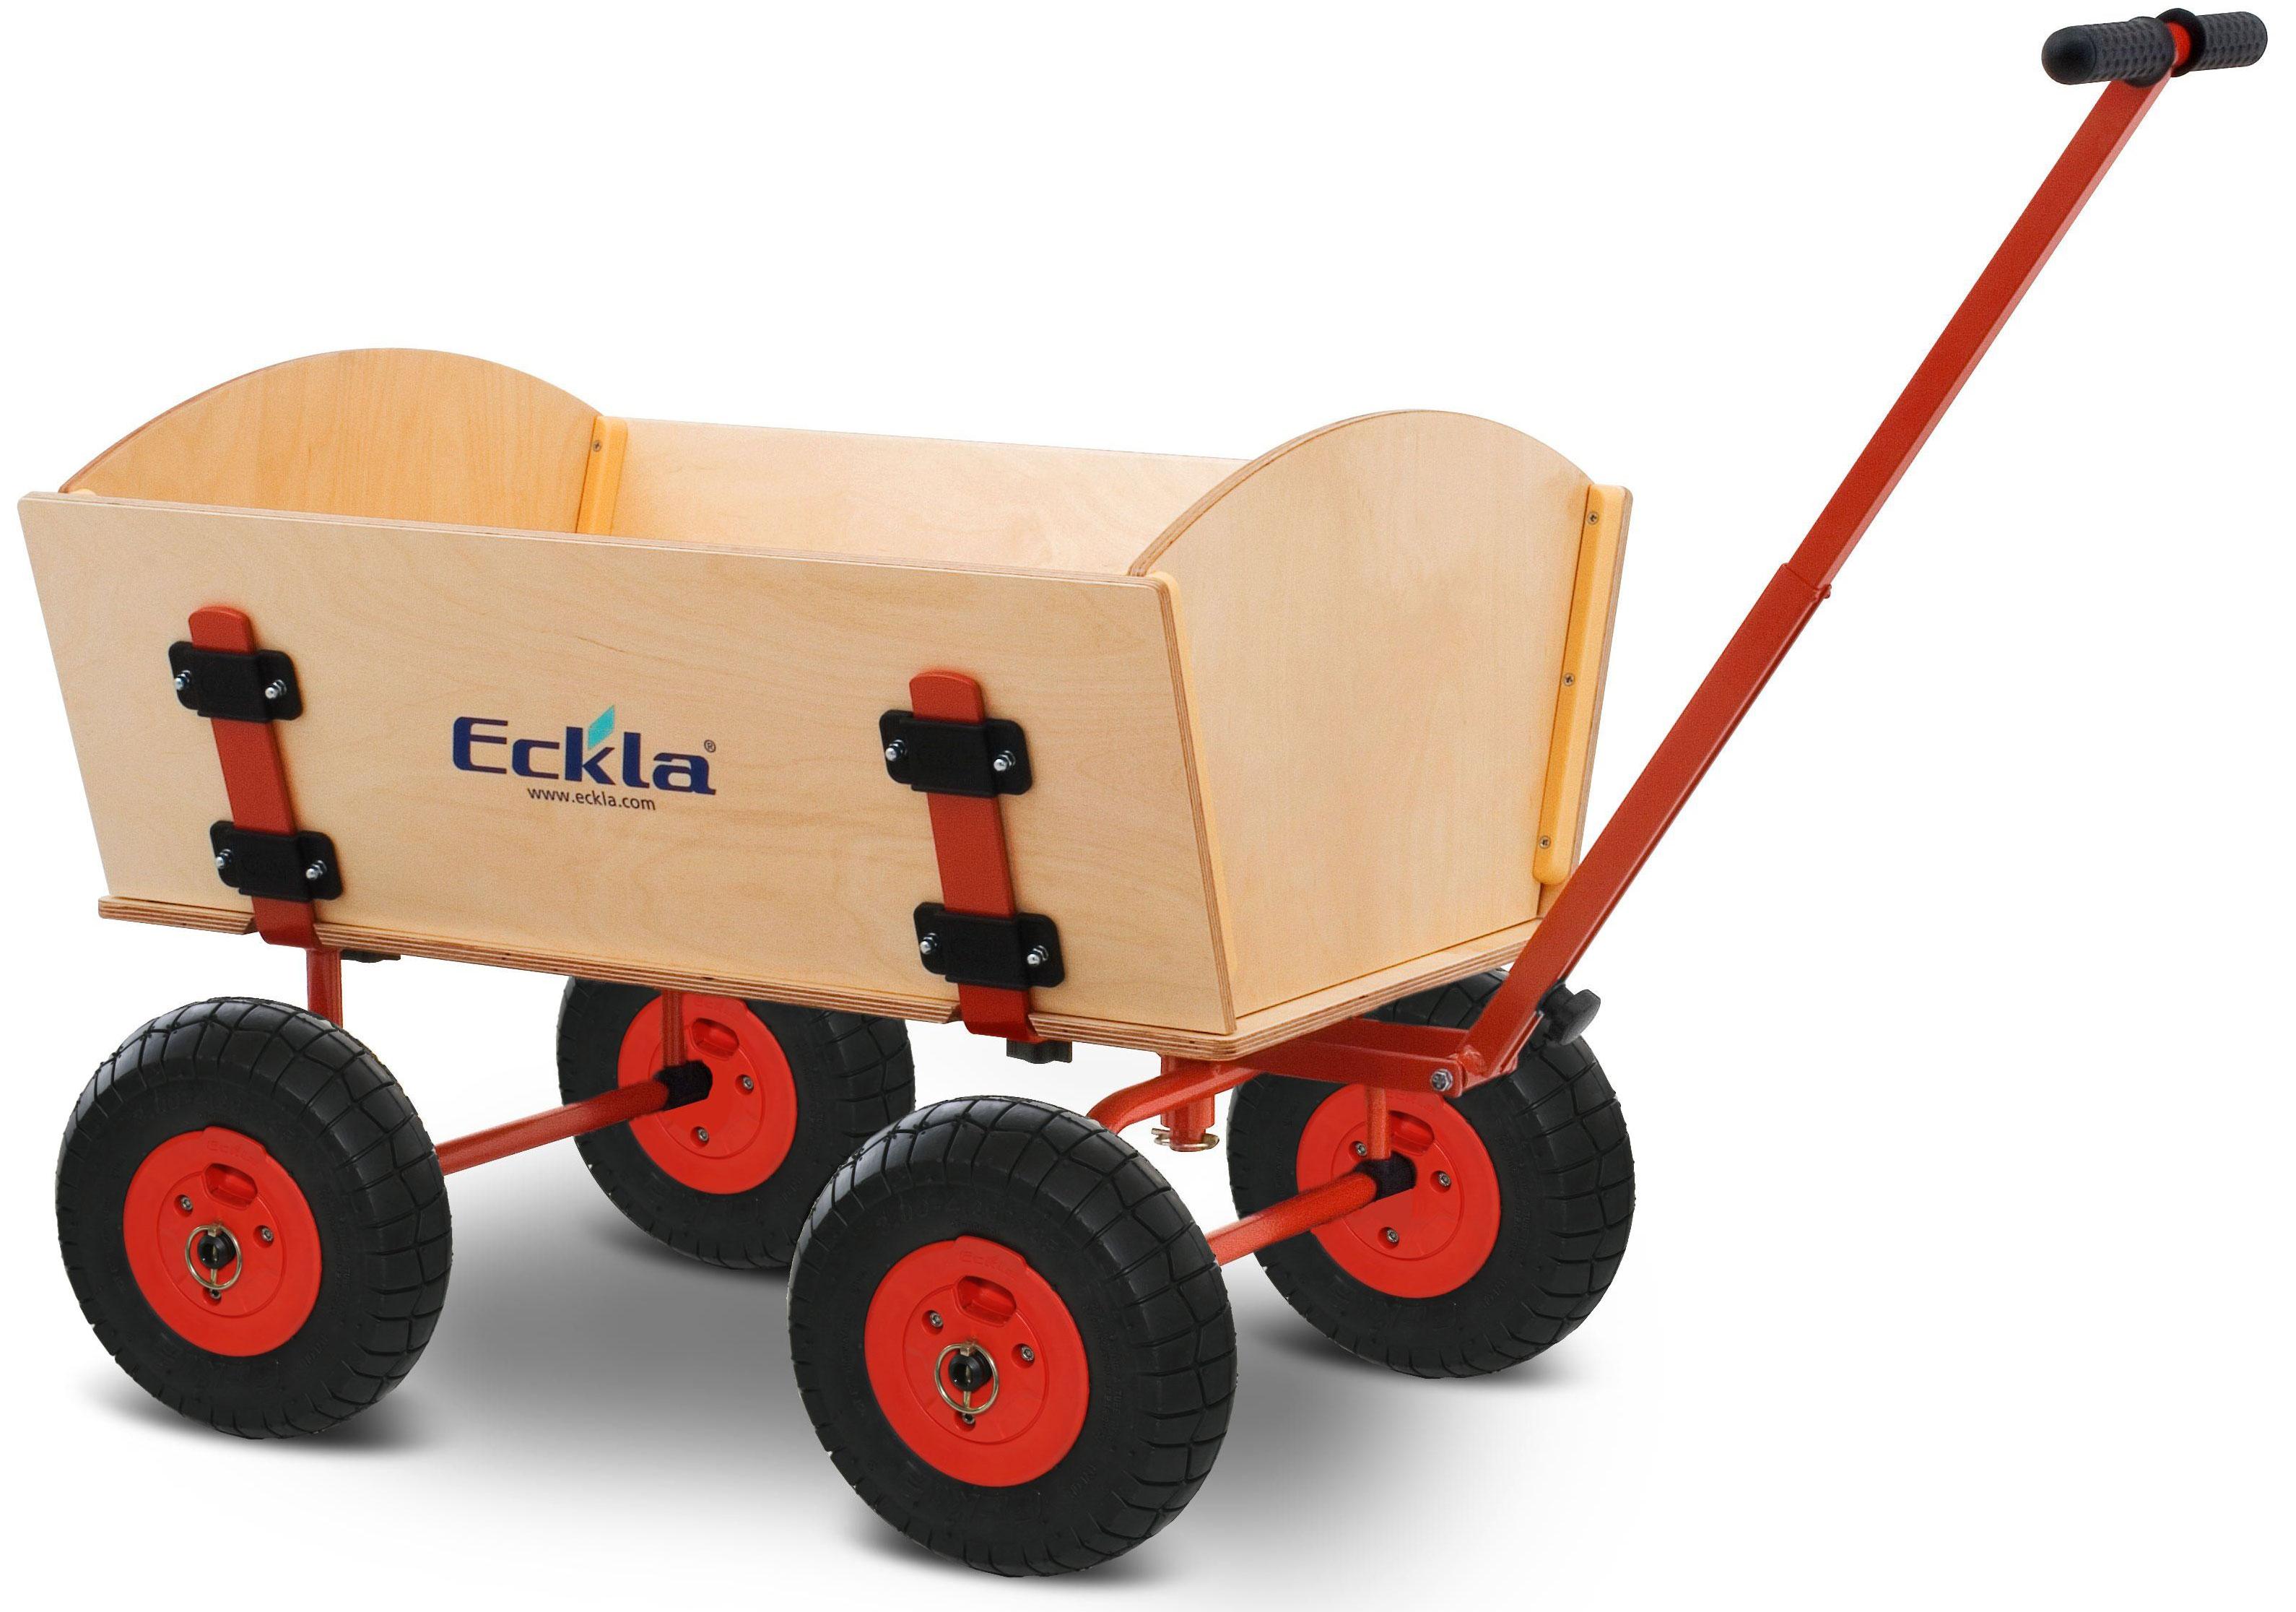 eckla bollerwagen faltbar easy trailer 70cm bei. Black Bedroom Furniture Sets. Home Design Ideas